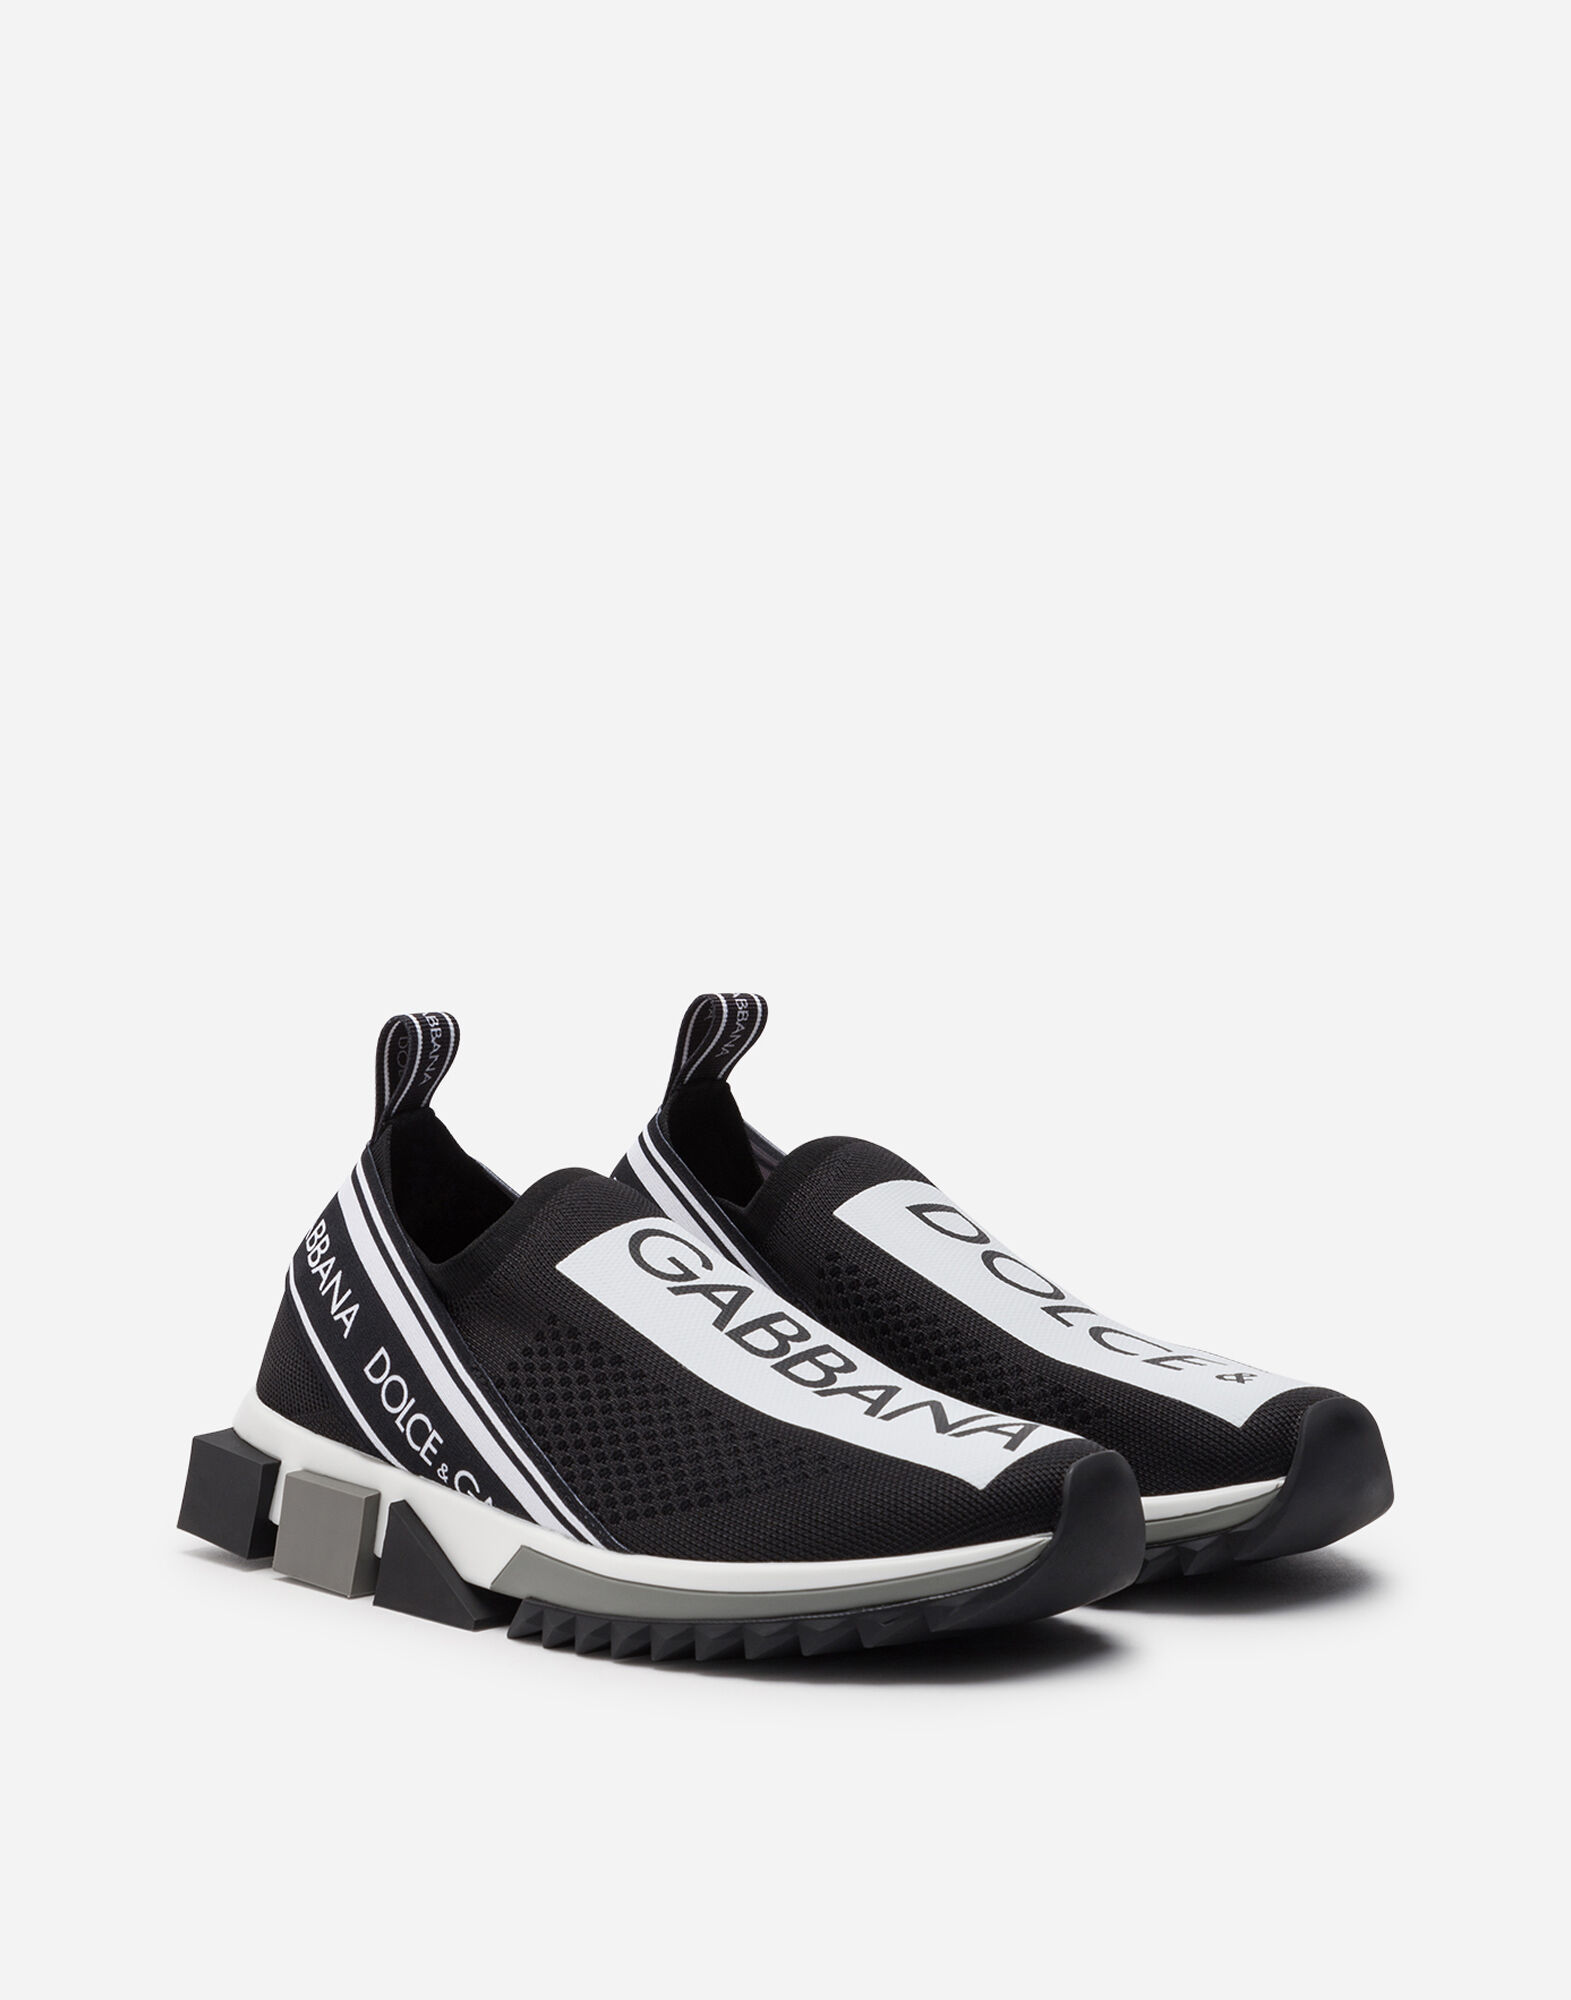 Sorrento Sneakers - Women's Shoes